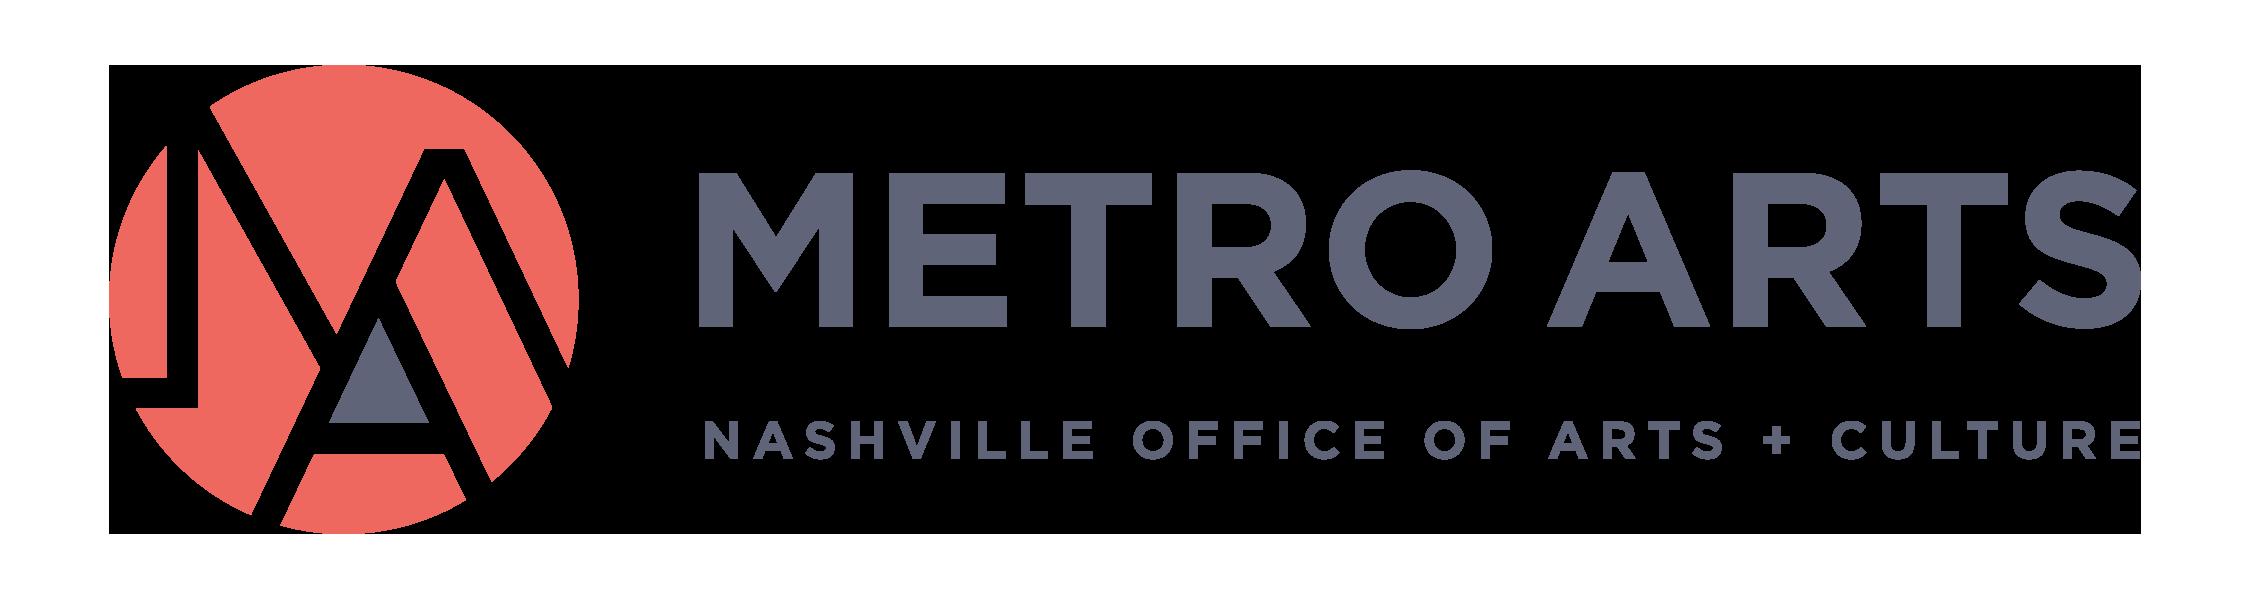 MetroArts-logo-horizontal-RGB.png